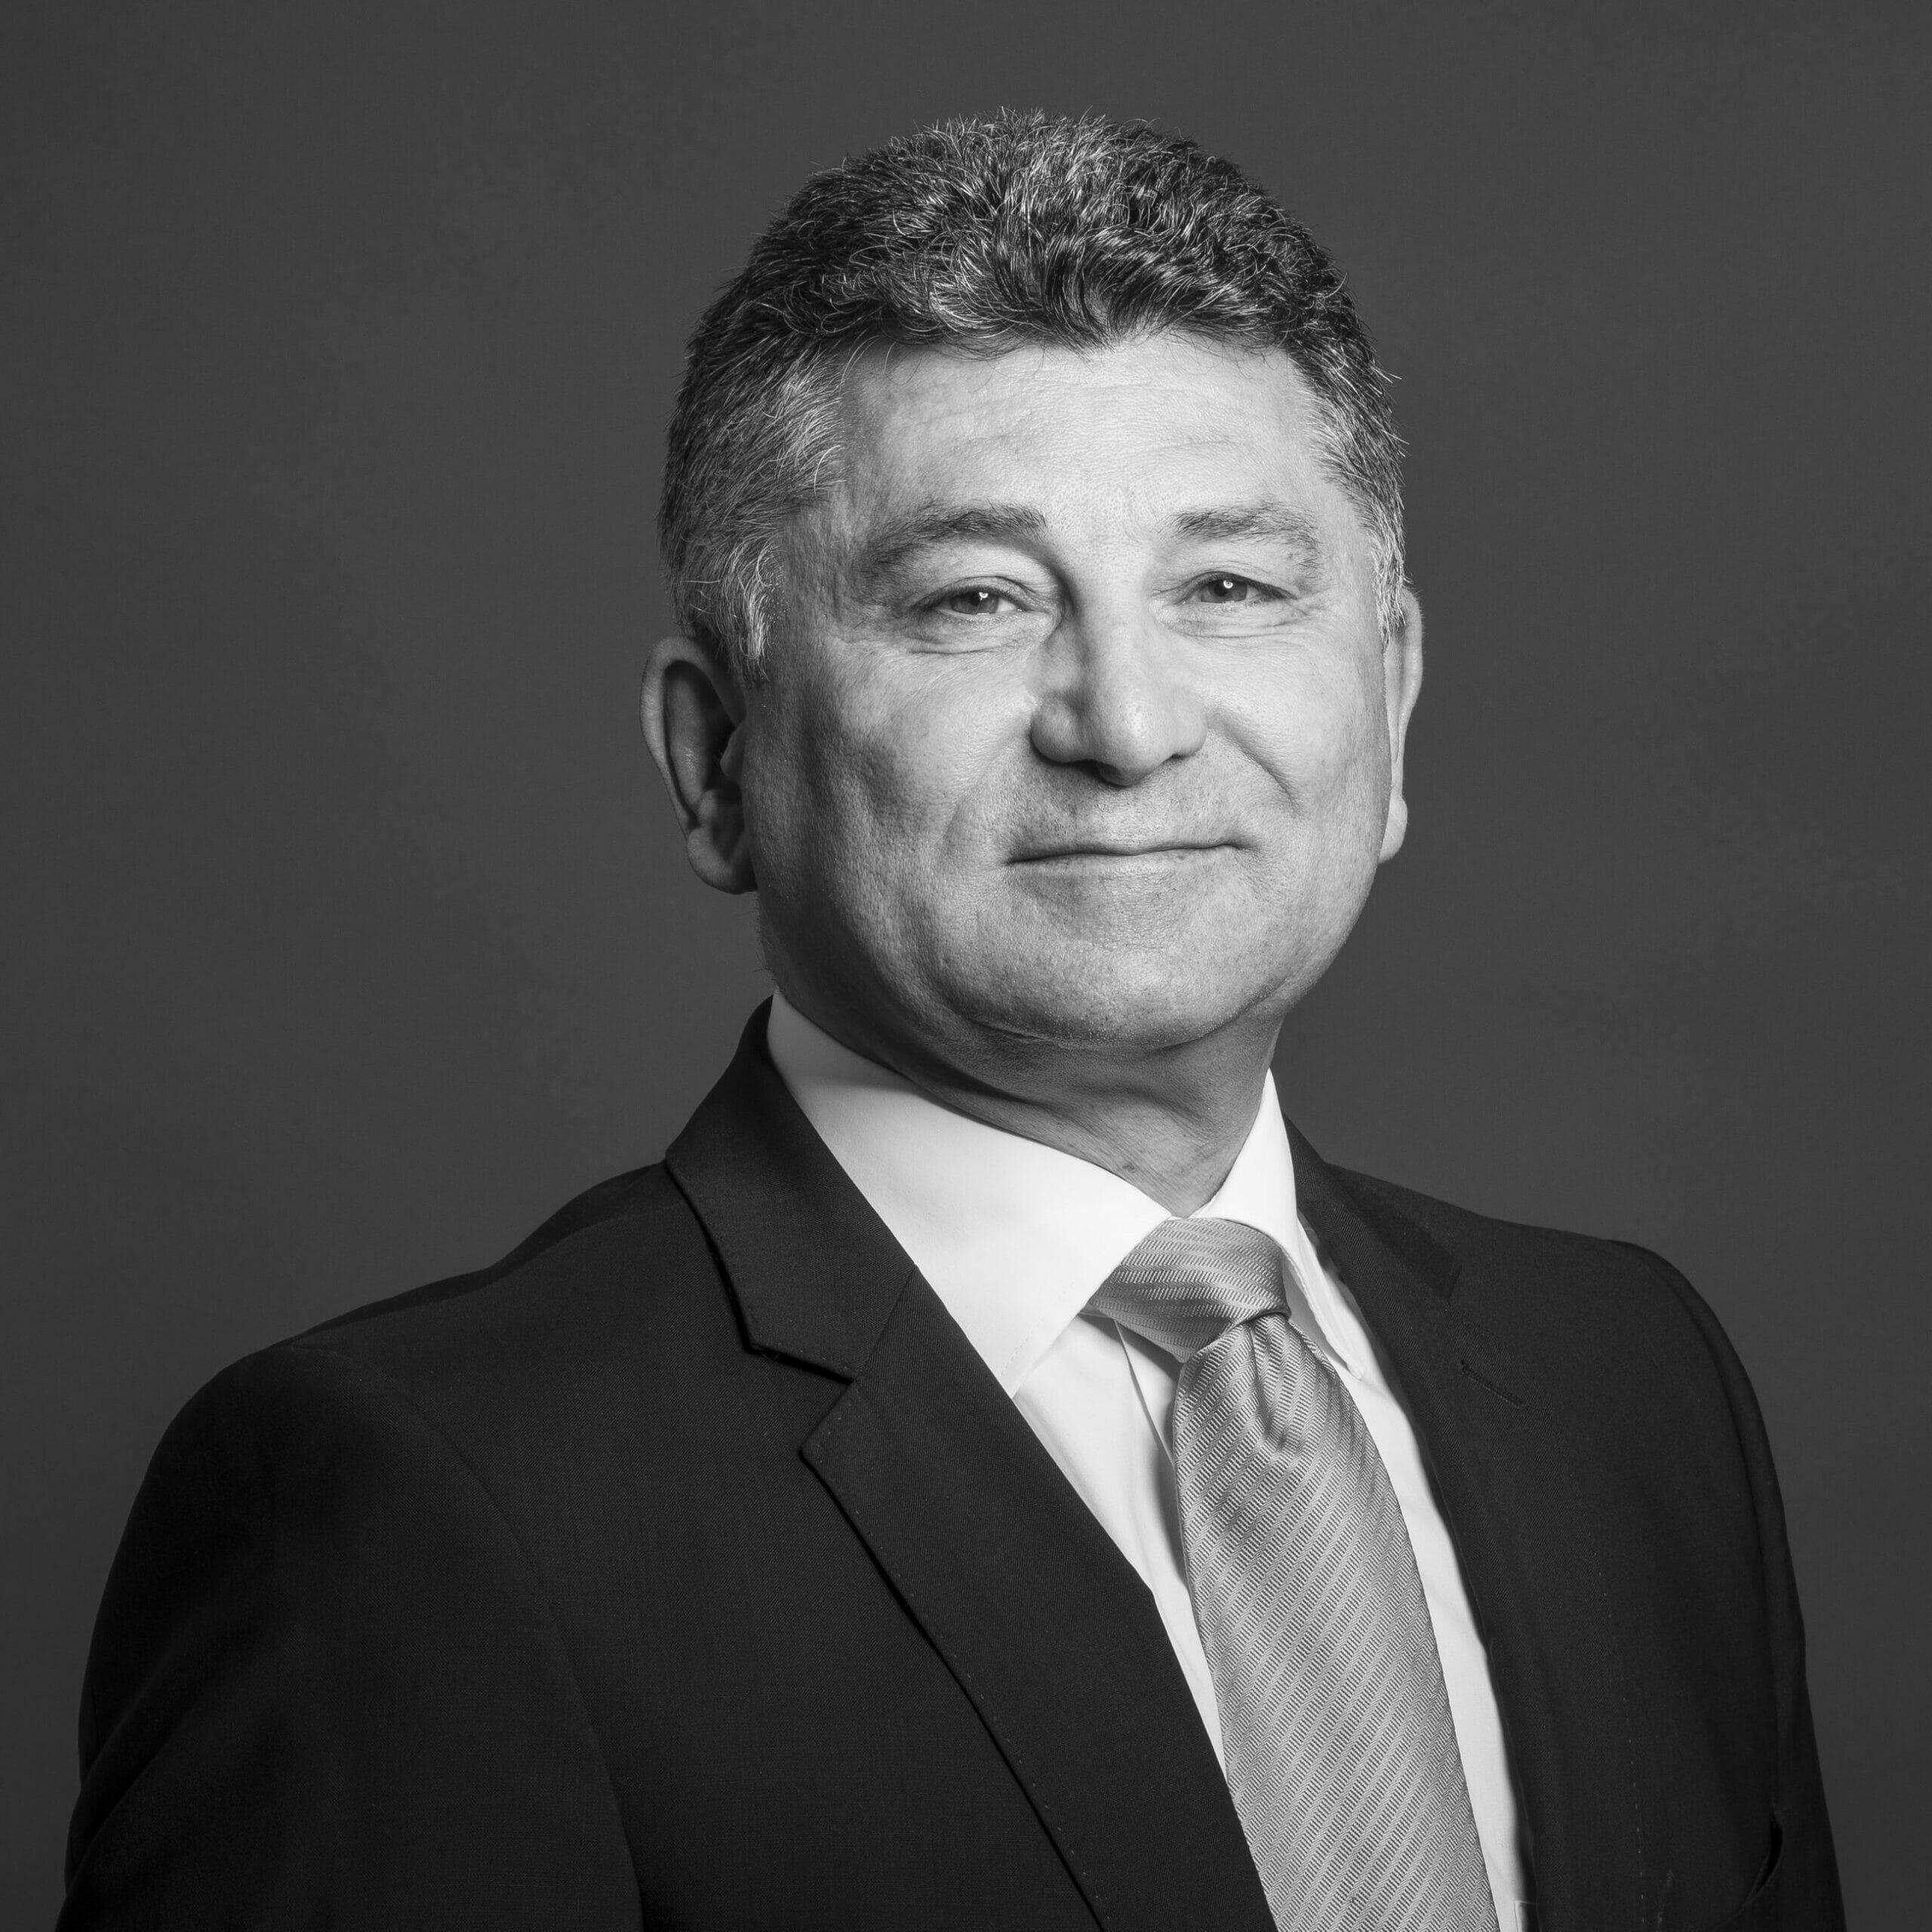 Dr. Michele Imobersteg